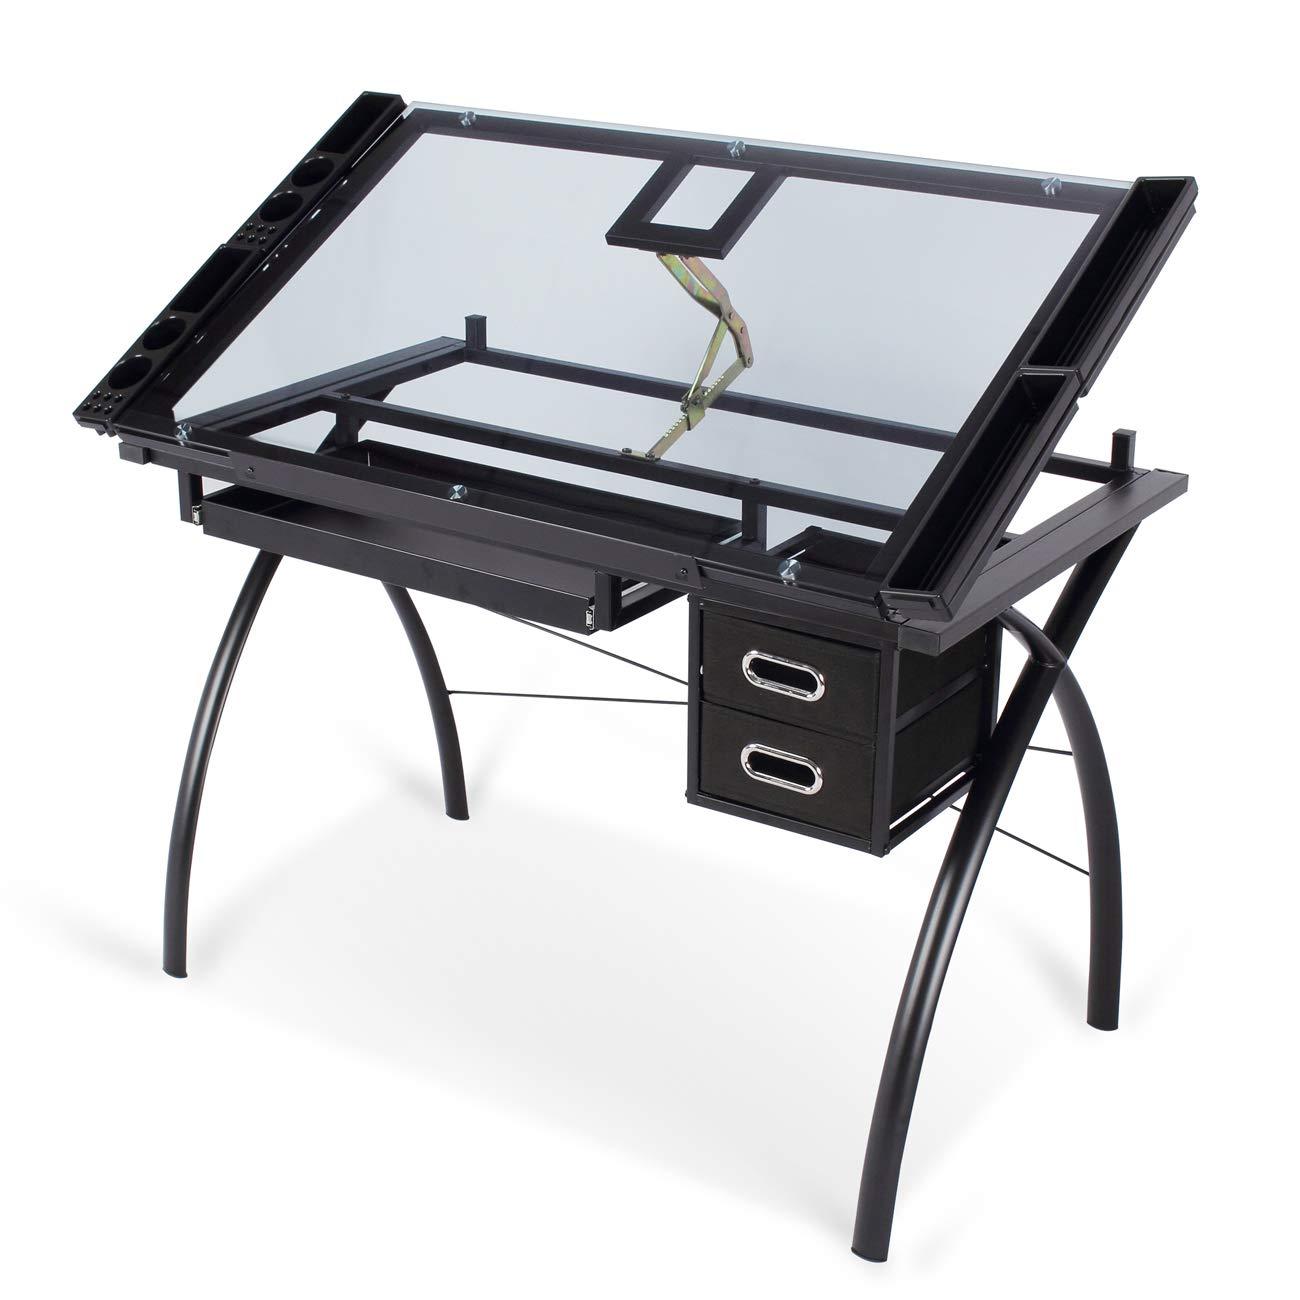 Belleze Drawing Craft Art Steel Draft Adjustable Table Glass Desktop for Studio Office w/Storage Drawers, Black